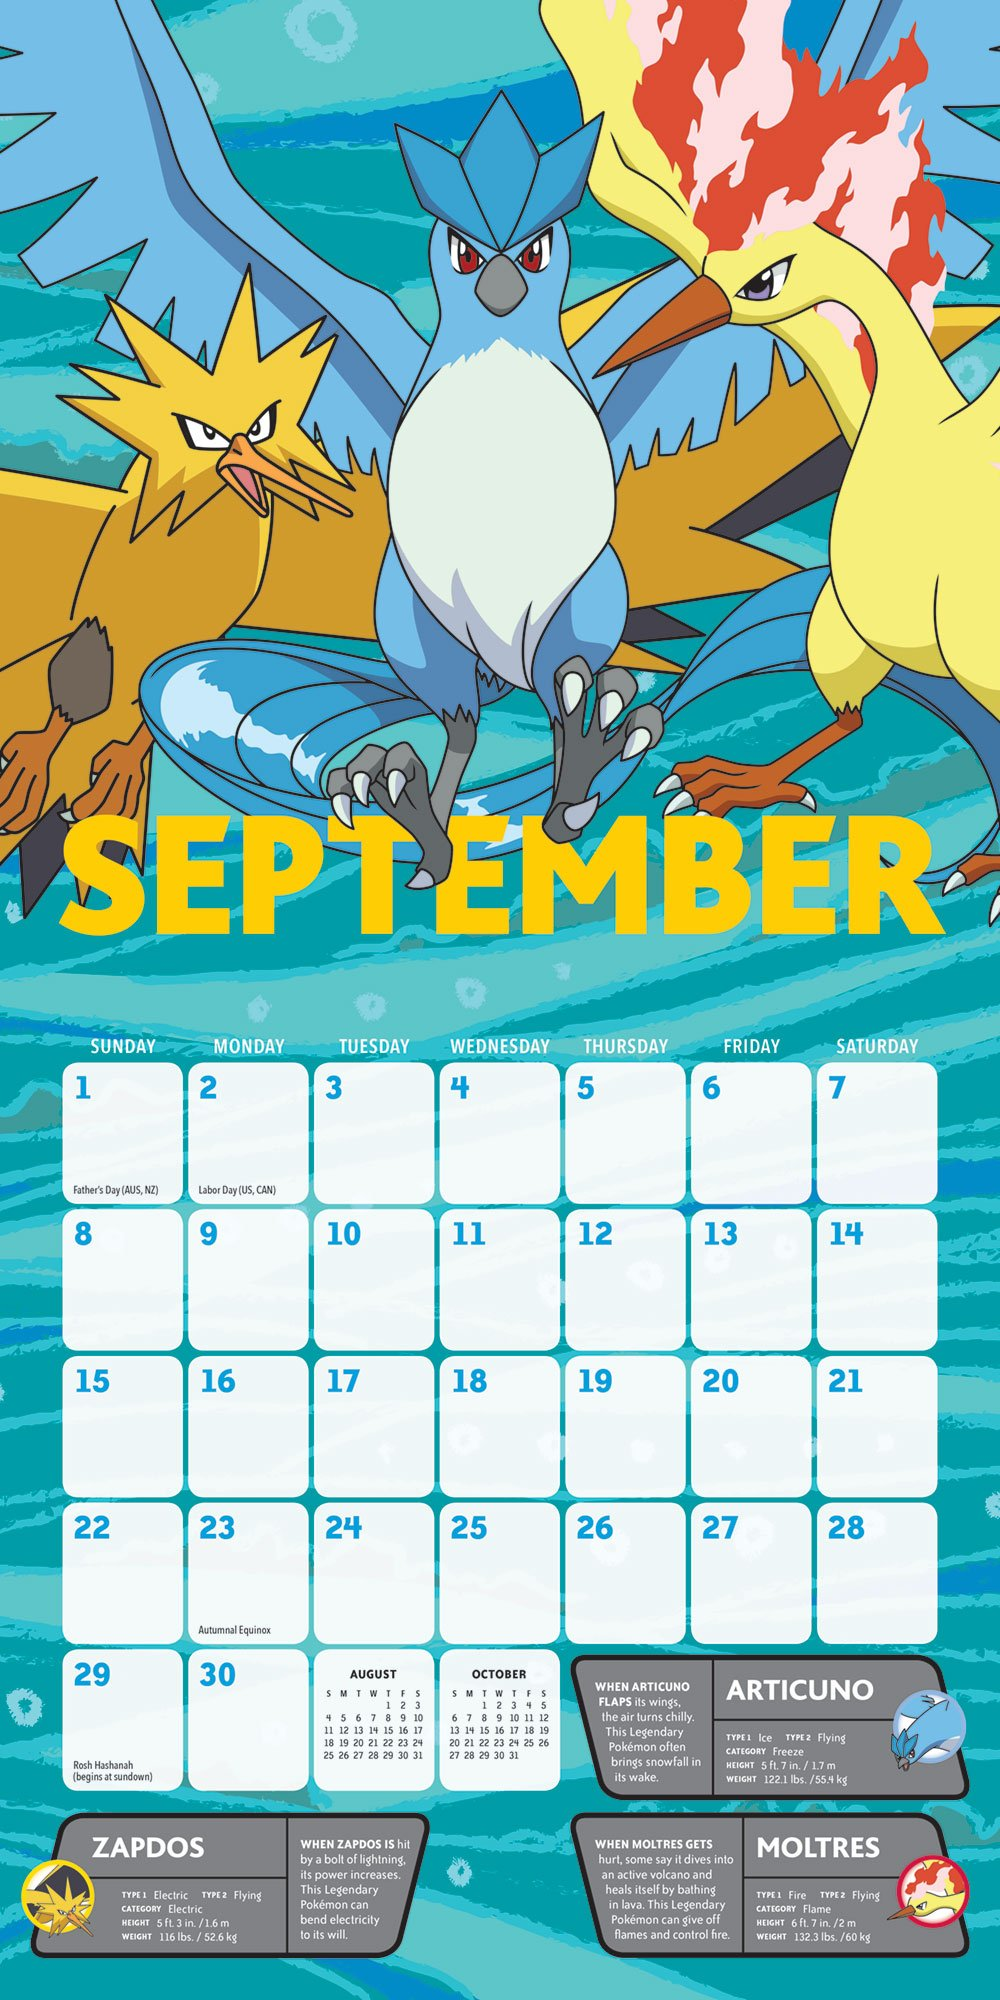 2019 Pokemon Calendar Pokémon 2019 Wall Calendar: Pokémon: 9781419731891: Amazon.com: Books